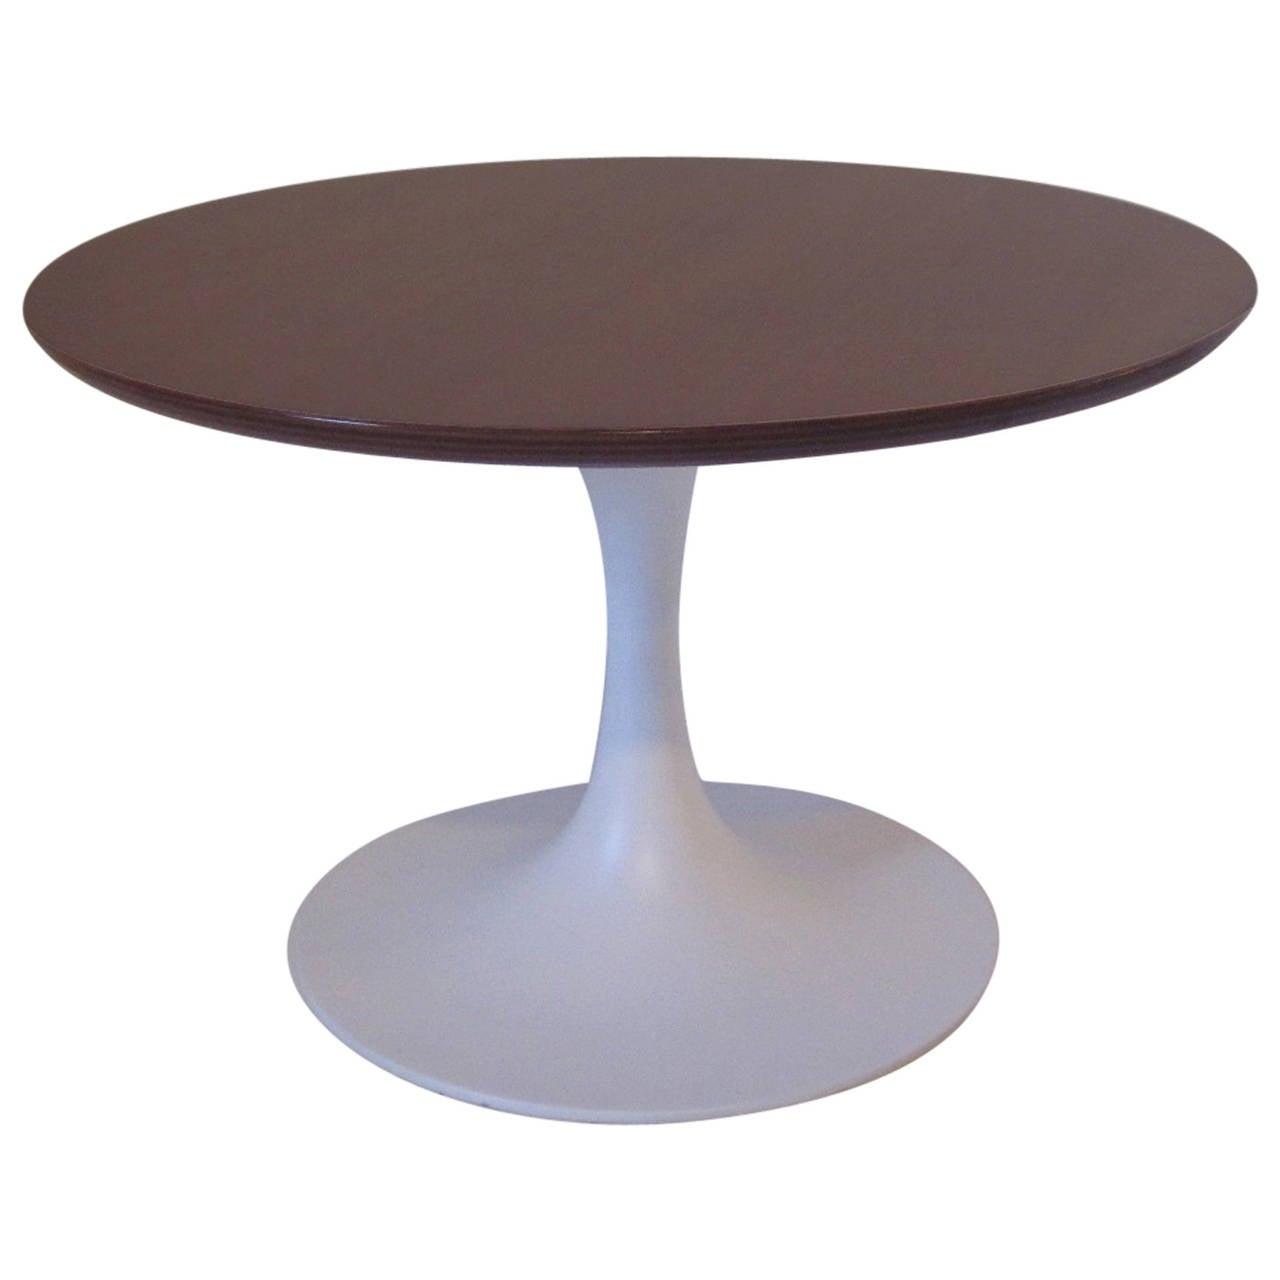 Saarinen Styled Walnut Tulip Side Table at 1stdibs